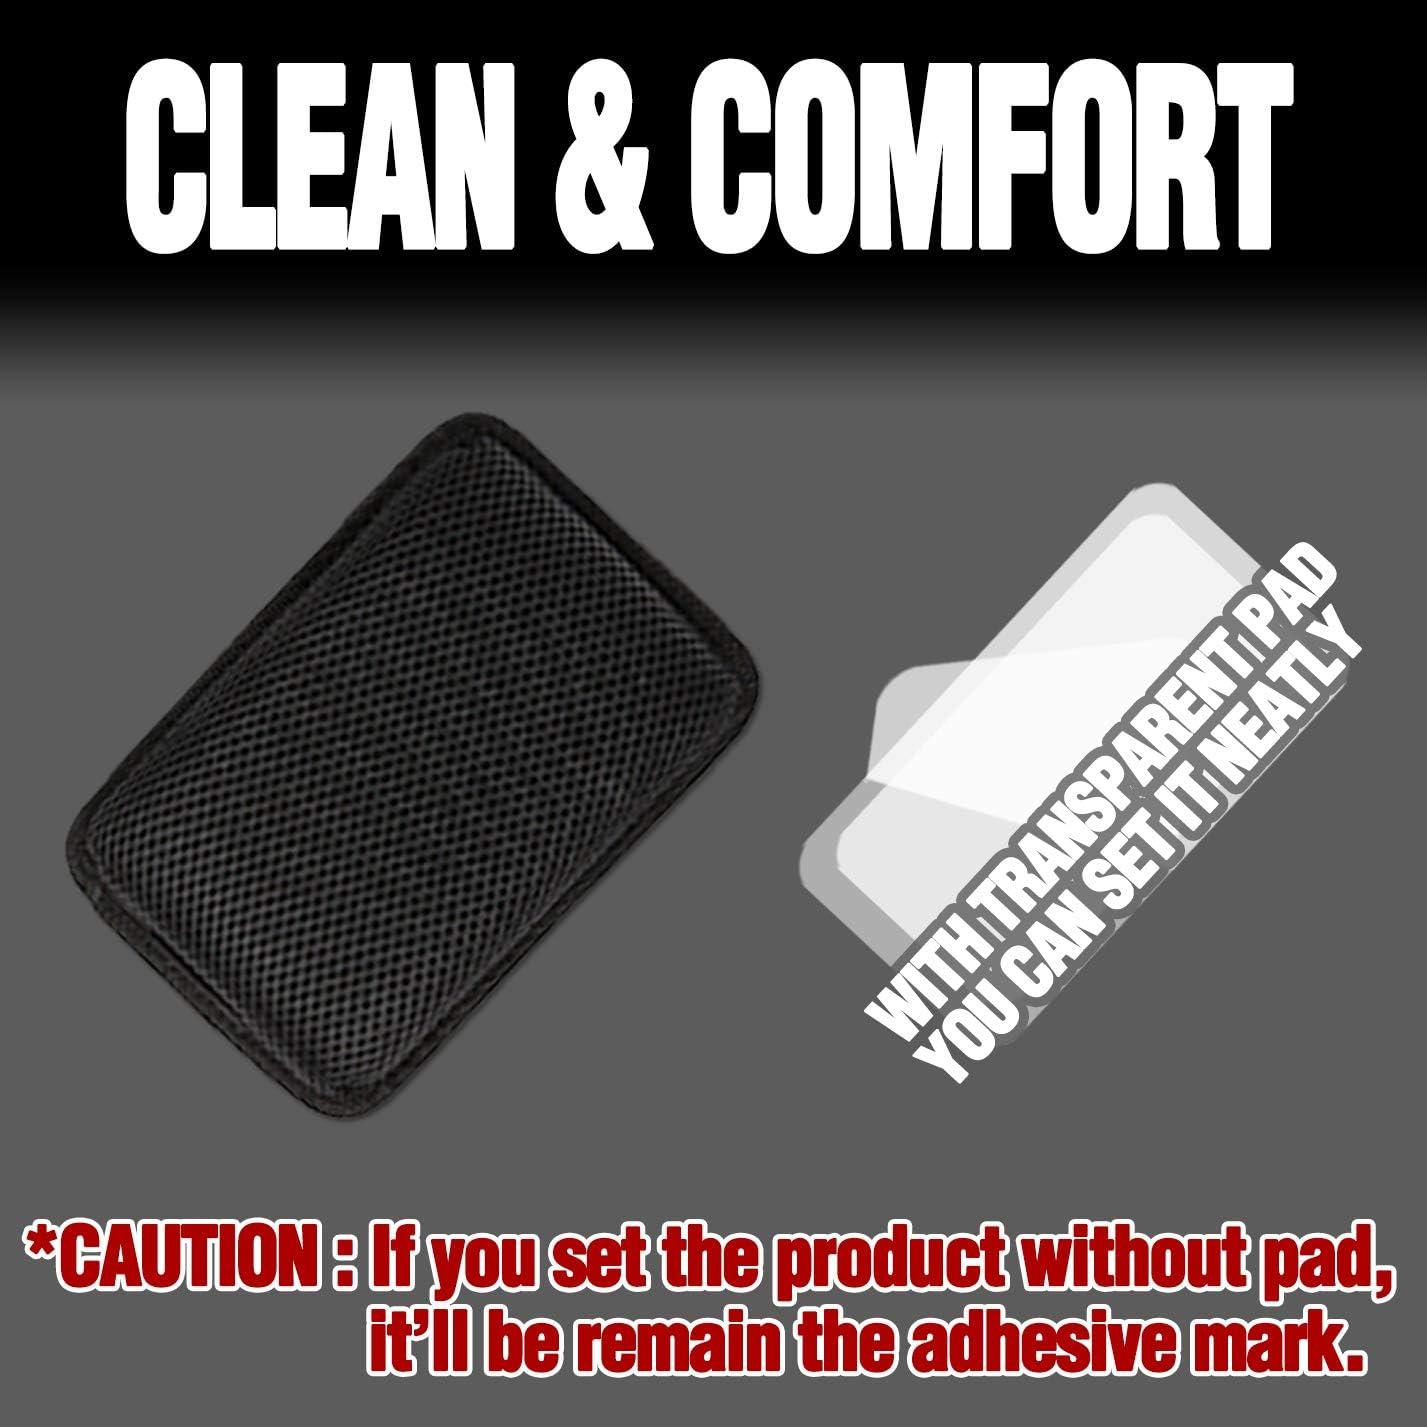 Mesh Black Normal KMMOTORS Multi Cushion with Non-Slip Pad for Make Comfortable Driving Environment